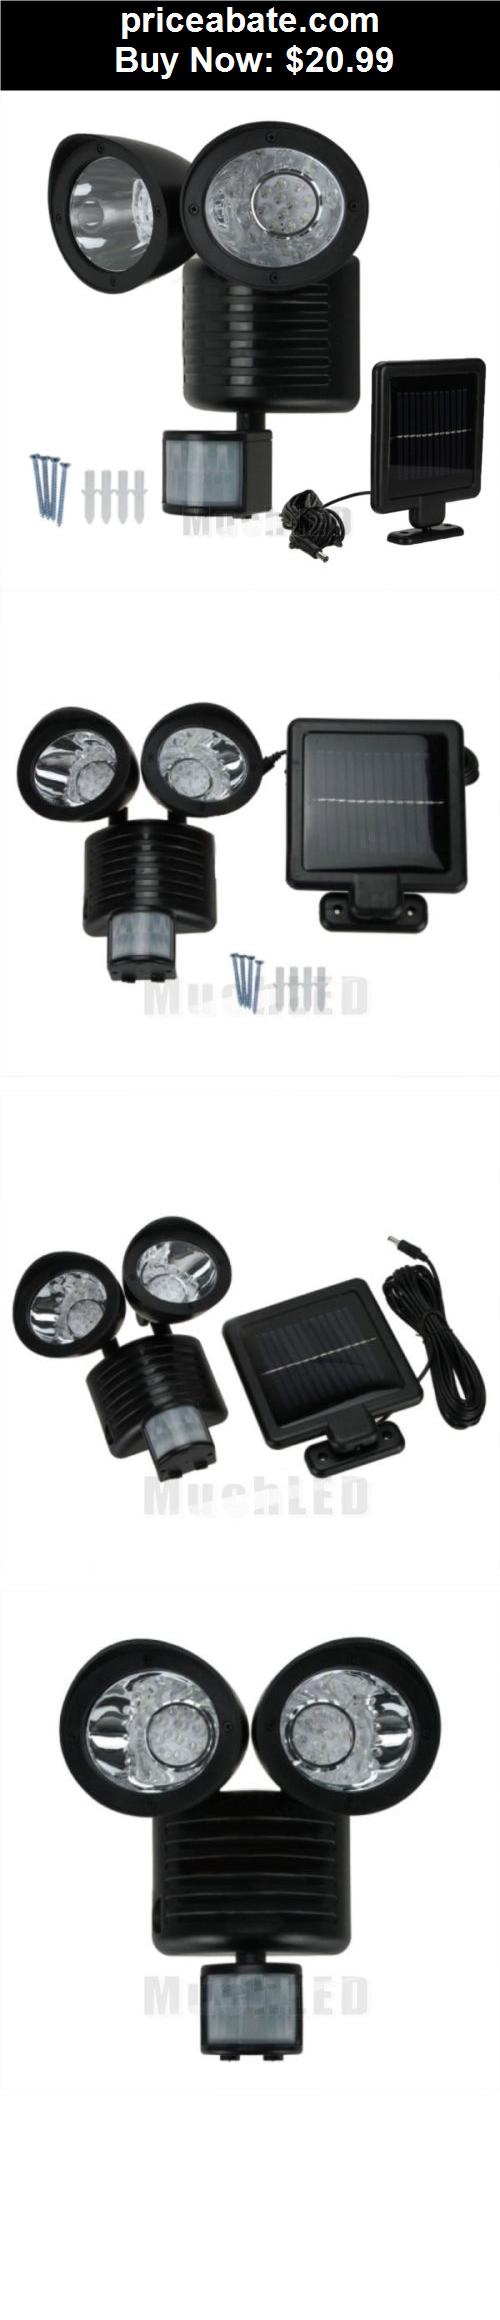 Farm Garden 22 LED Solar Powered Motion Sensor PIR Security Light